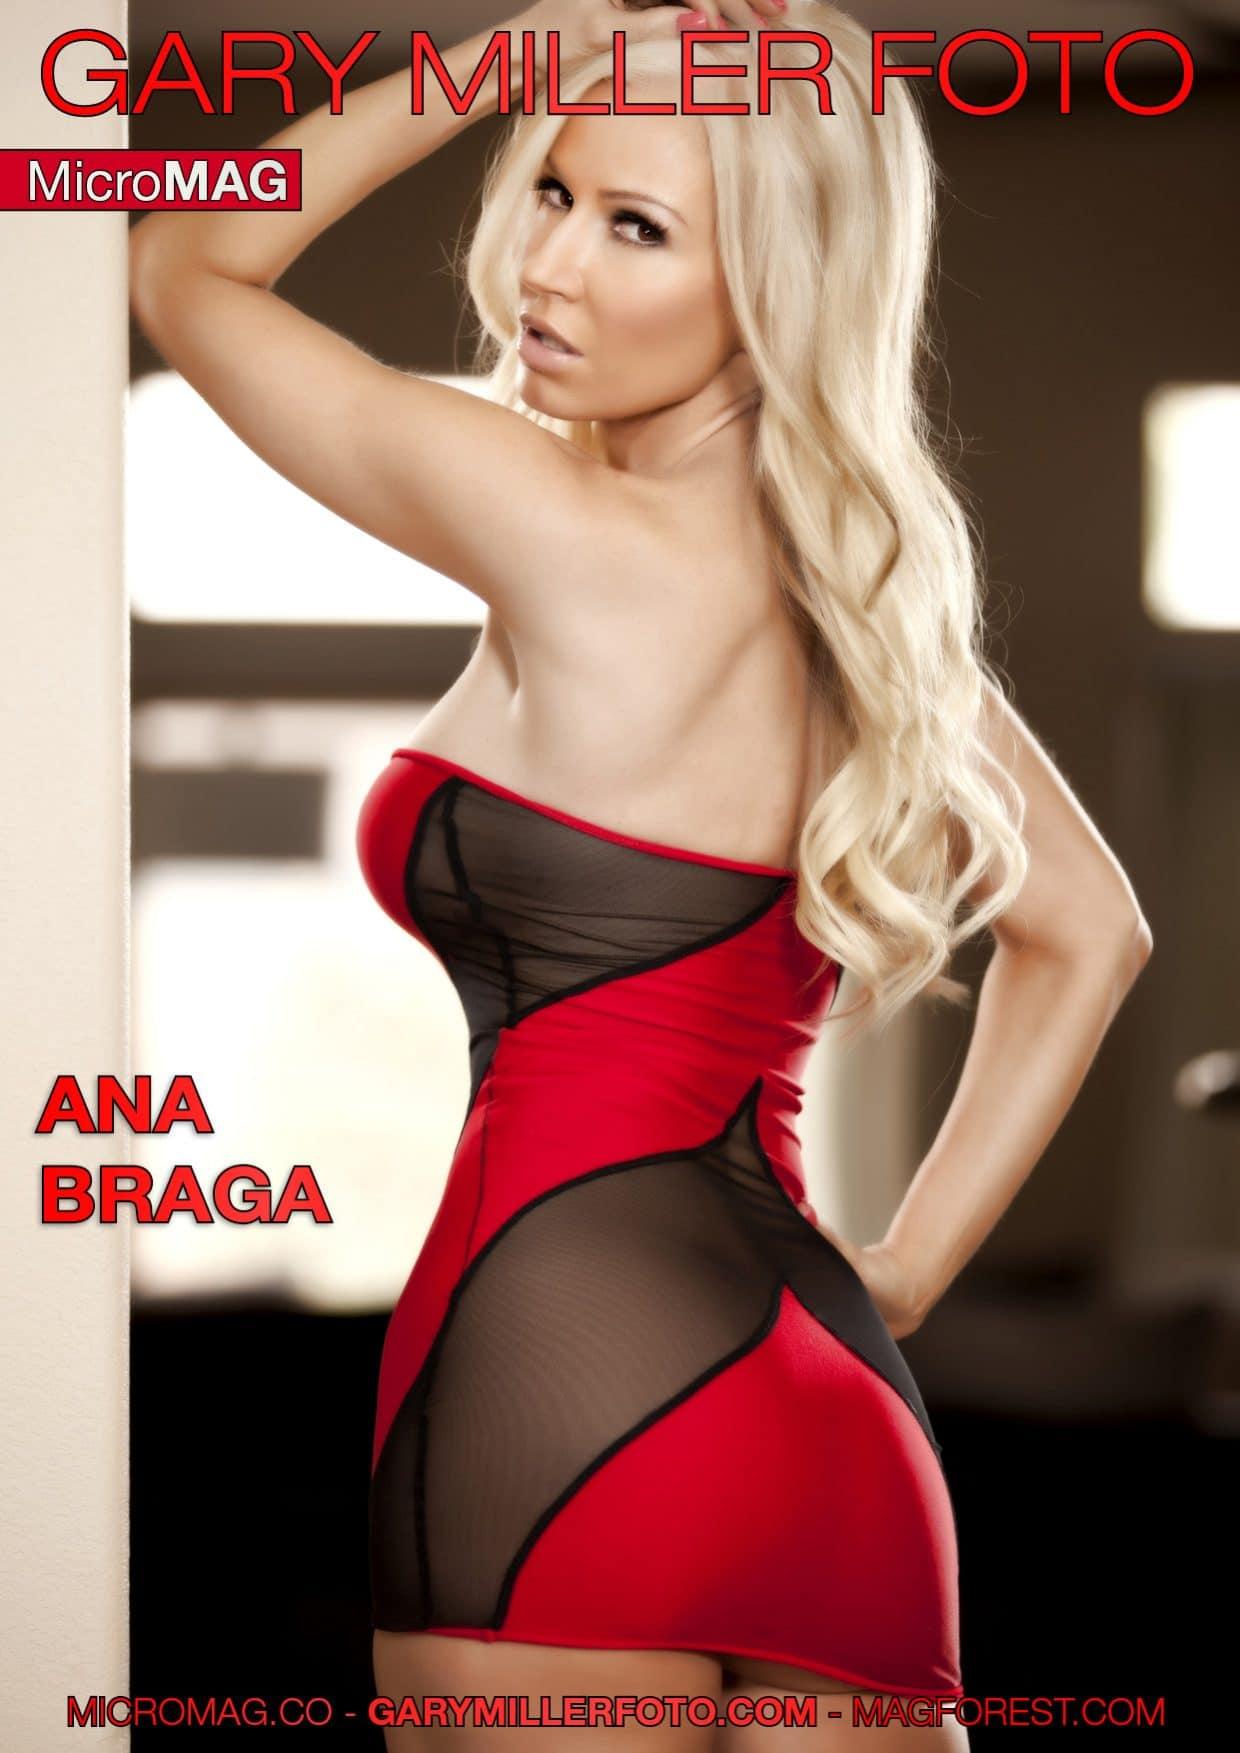 Gary Miller Foto MicroMAG – Ana Braga 1